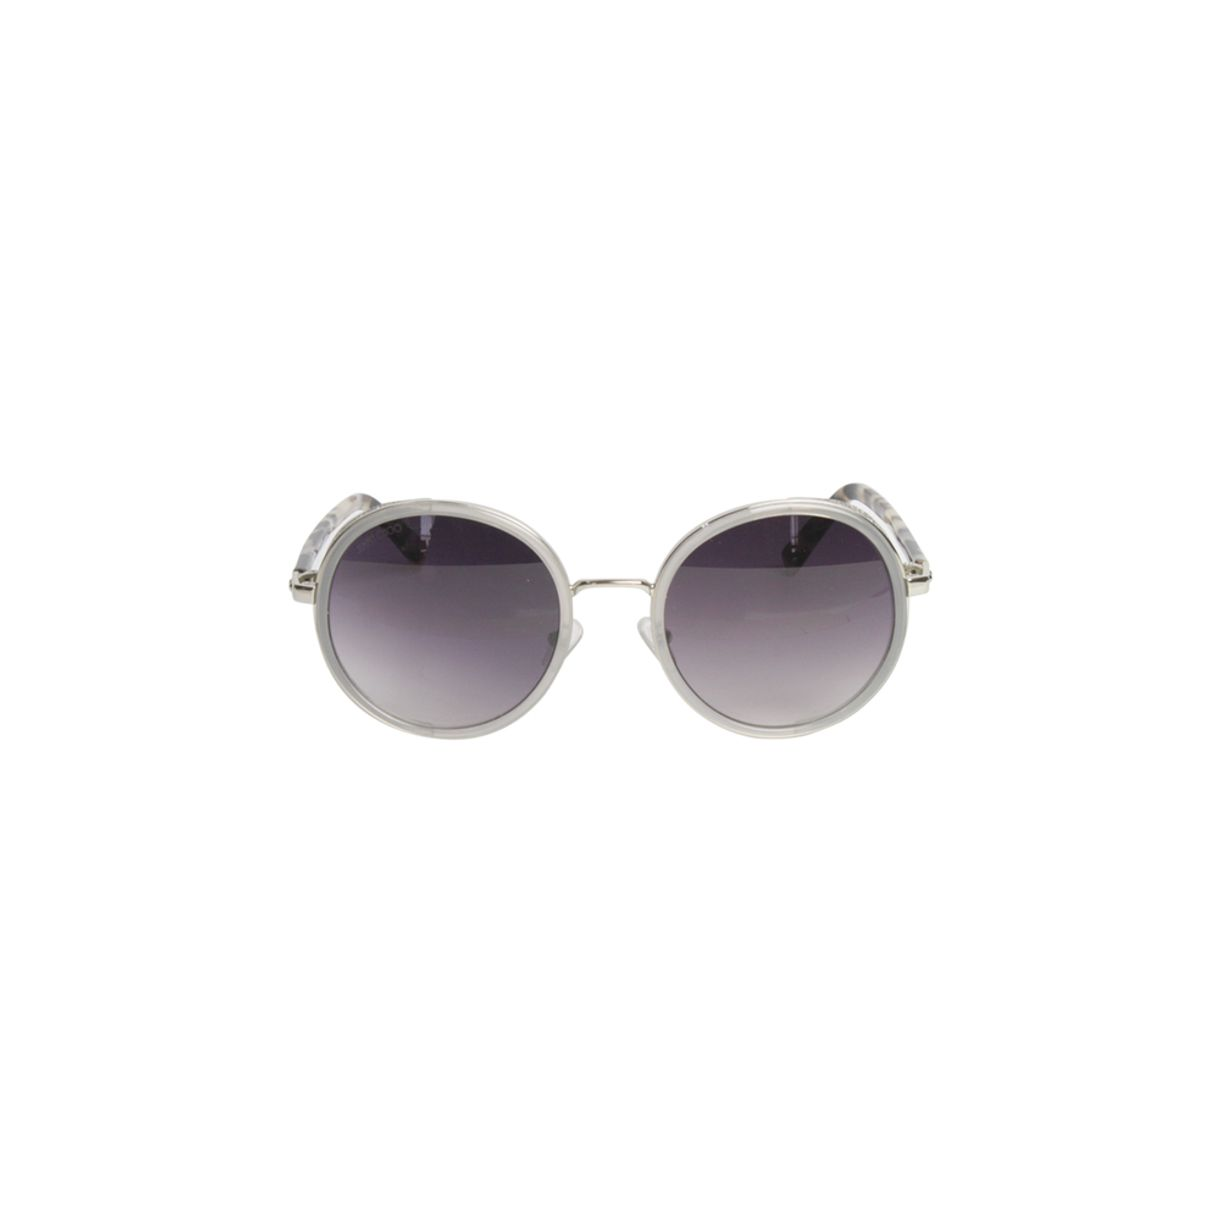 Oculos-Jimmy-Choo-Andie_E-Prata